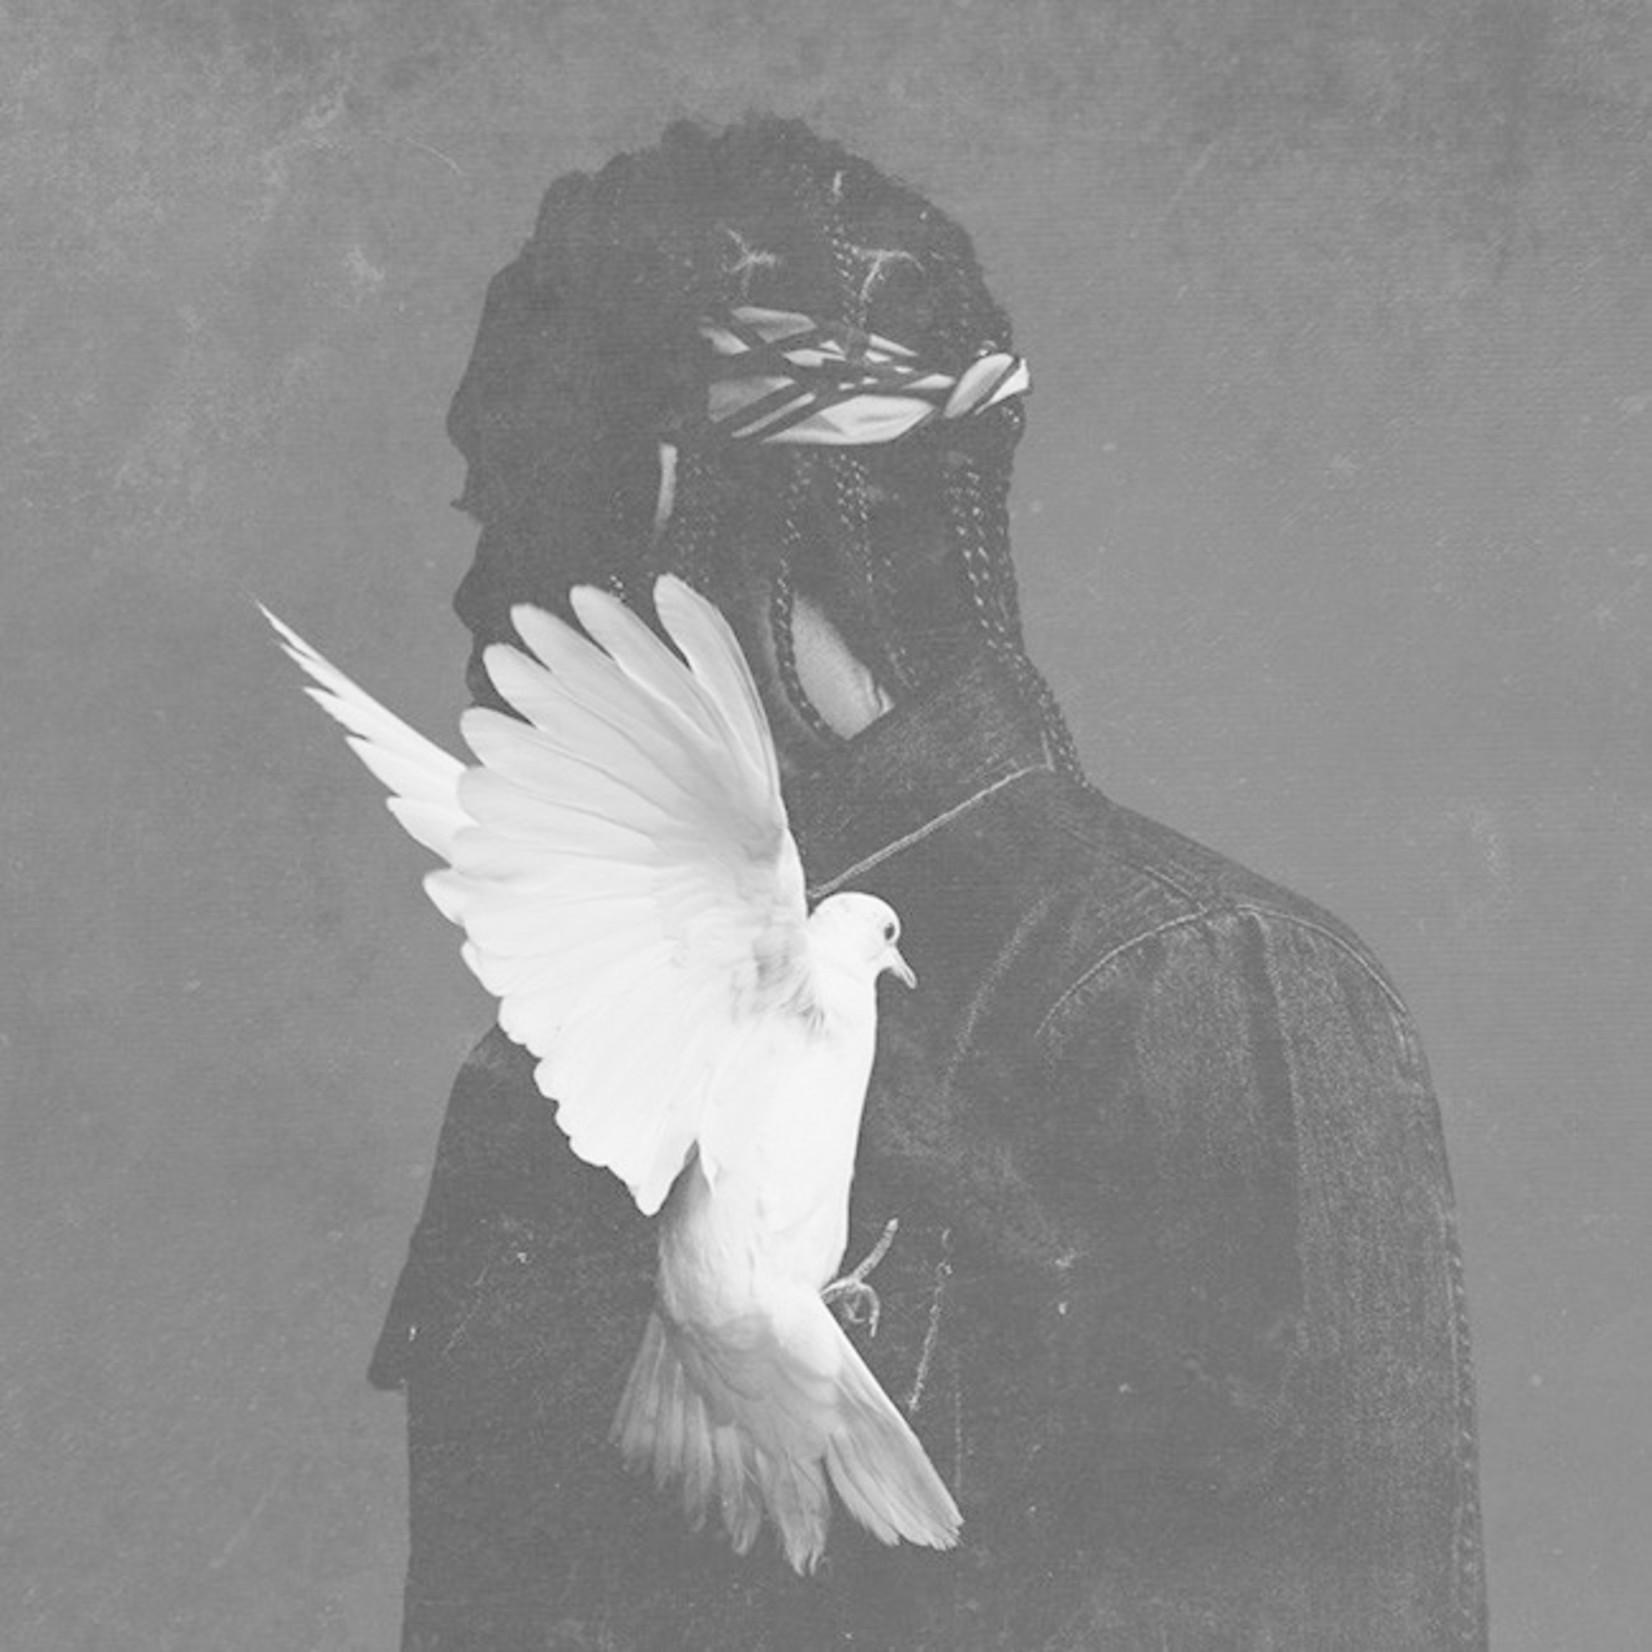 [New] Pusha T: King Push - Darkest Before Dawn: The Prelude